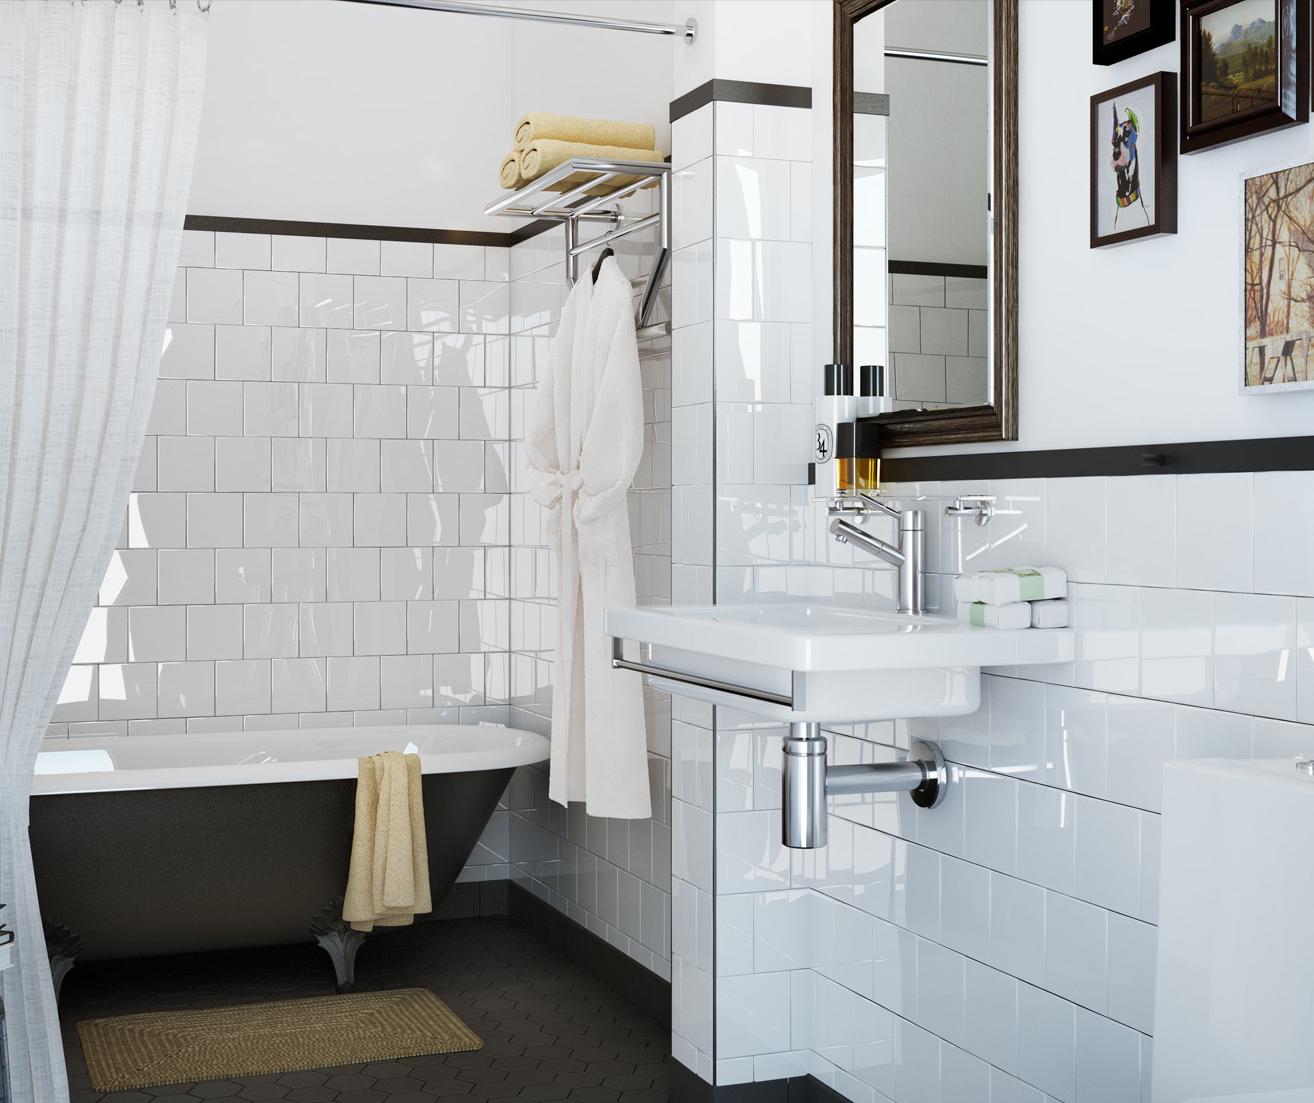 slate on slate | Bathroom | Pinterest | Slate, Bath and Bathroom ...